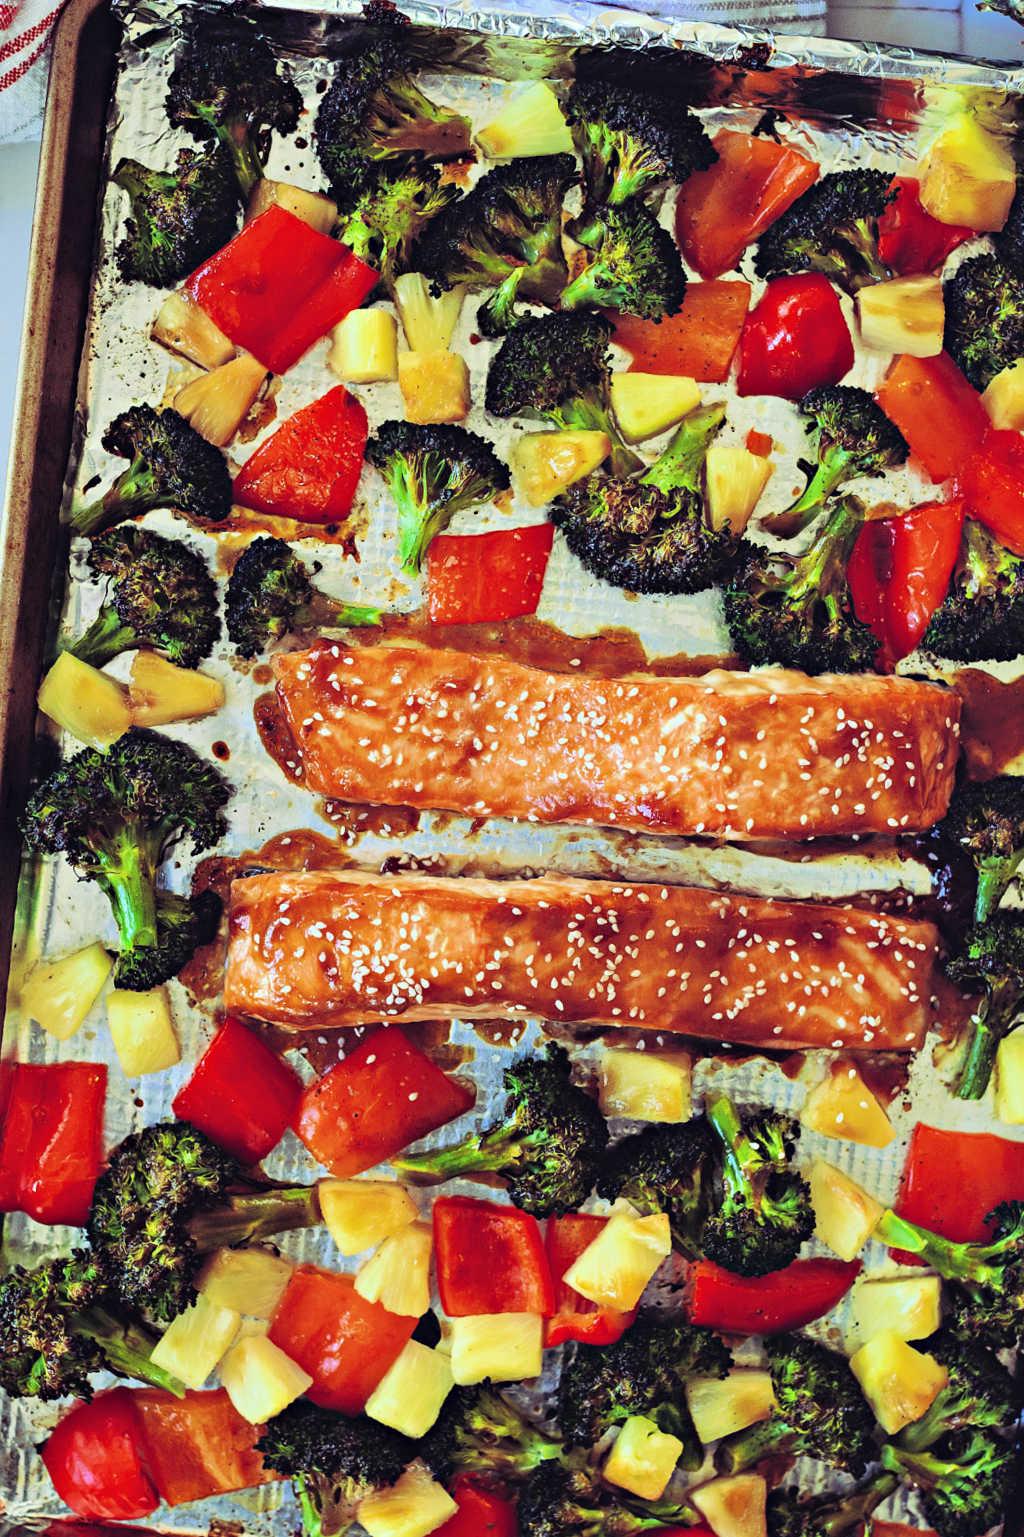 teriyaki salmon, broccoli, red bell pepper, and pineapple on a sheet pan